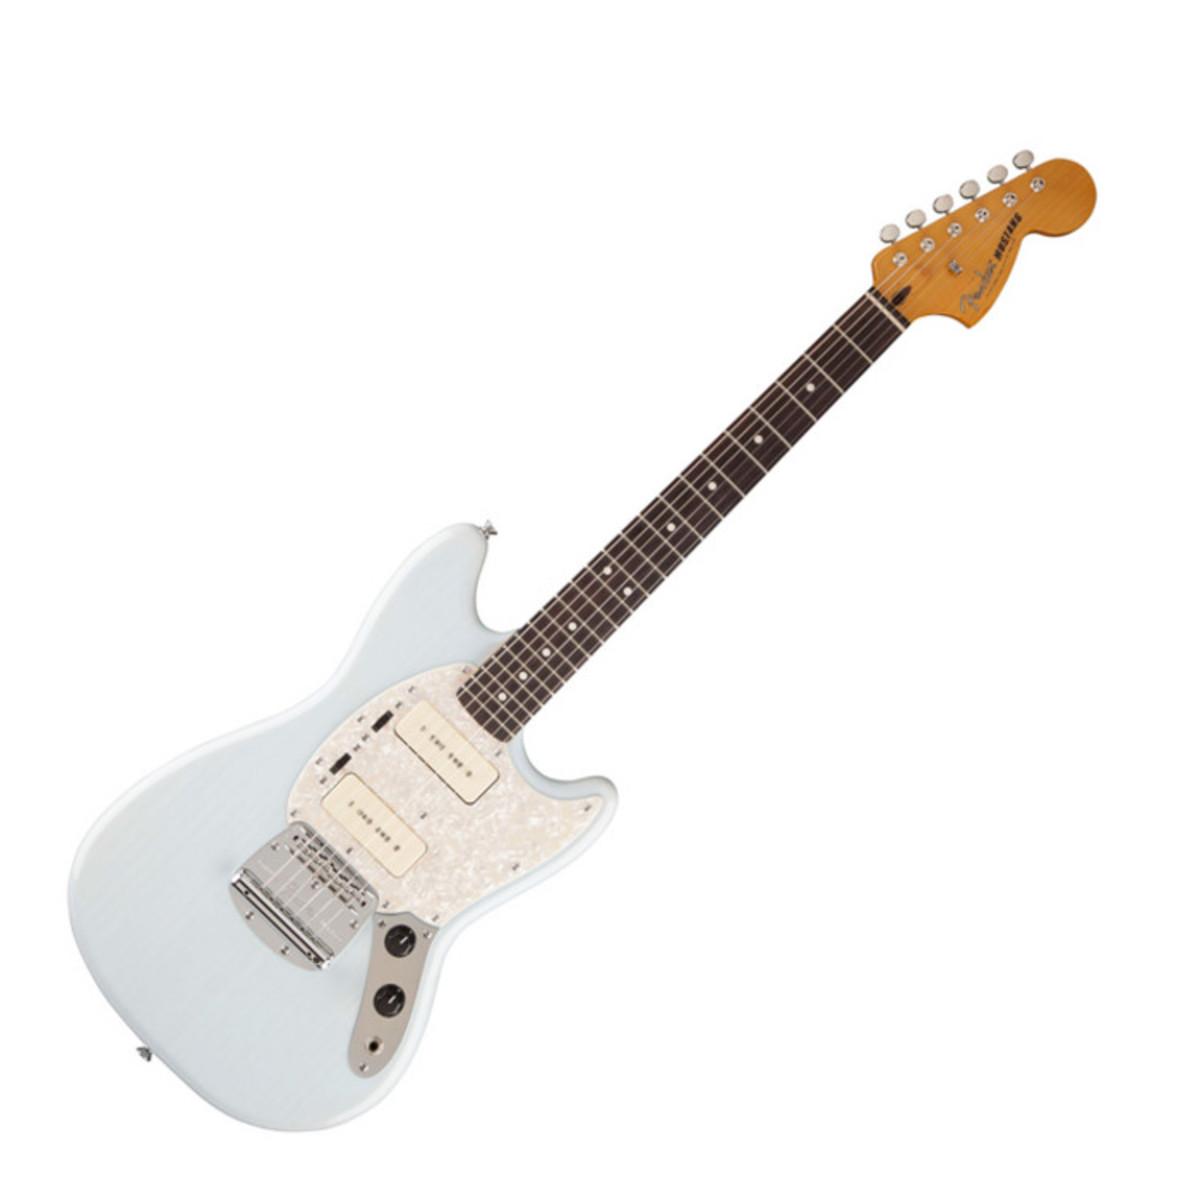 Fender Modern Player Mustang Electric Guitar Daphne Blue